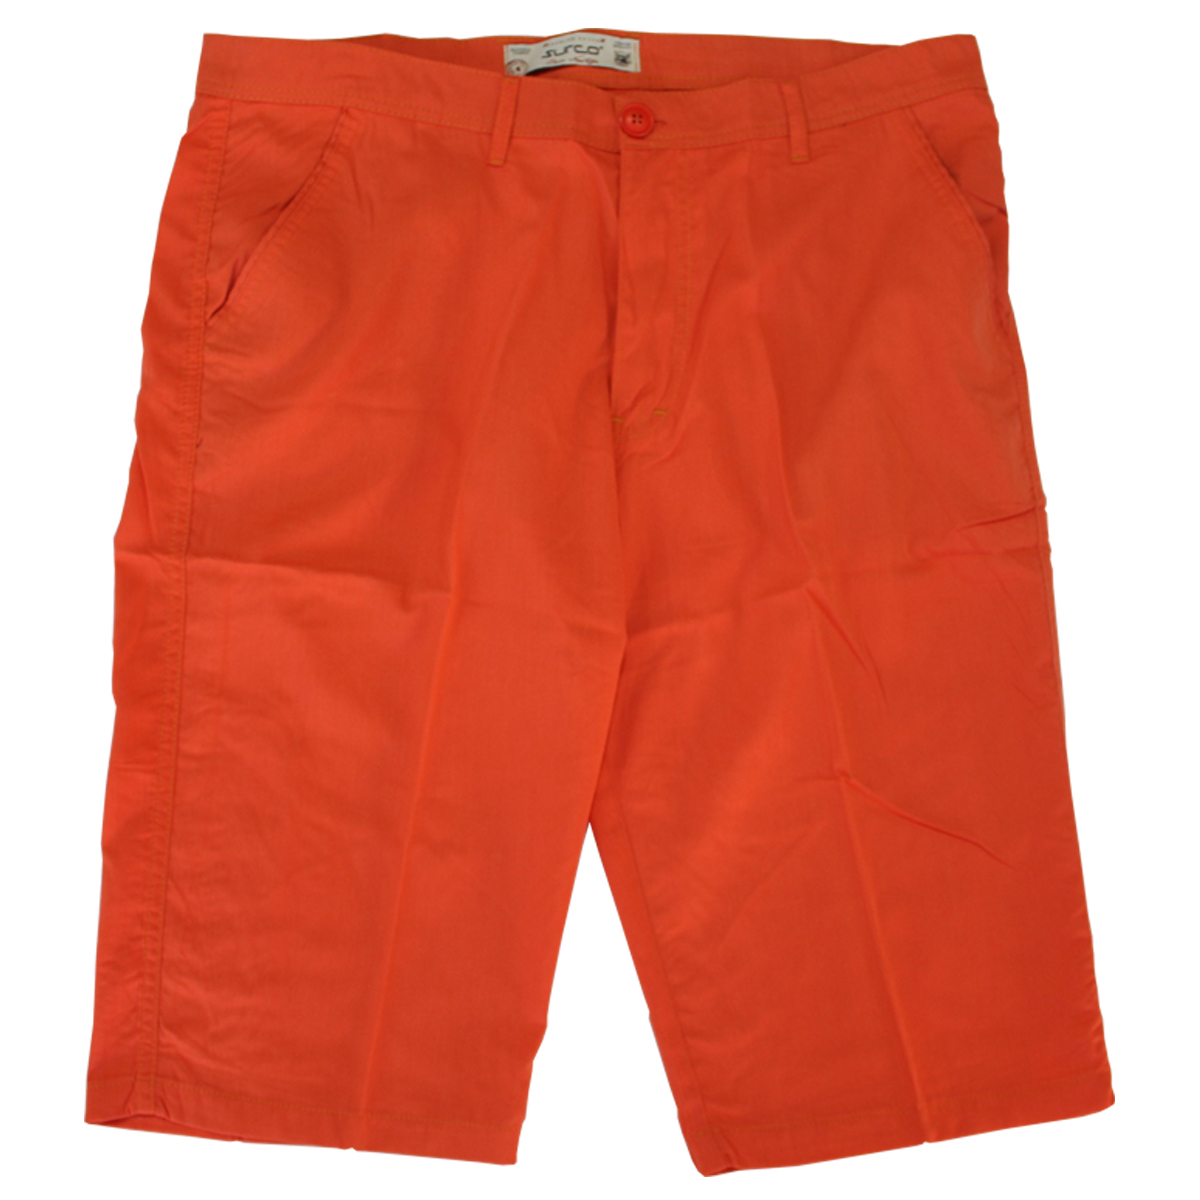 Pantalon trei sferturi portocaliu, Marime 54 - egato.ro